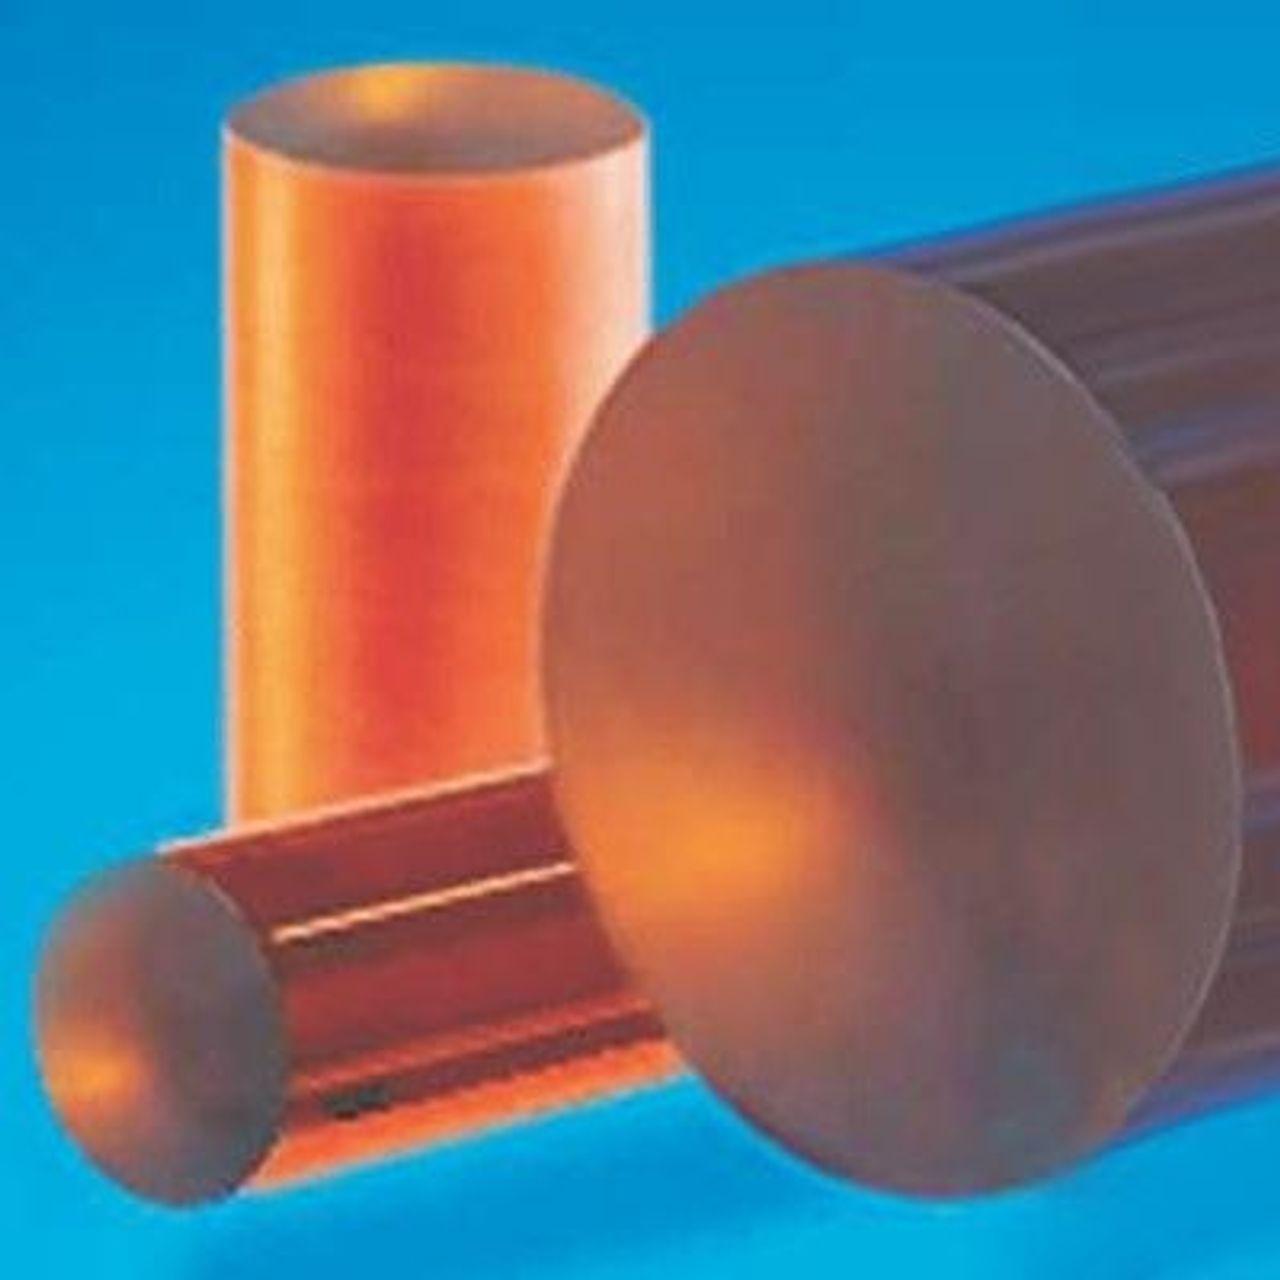 PEI (Polyetherimide) staf